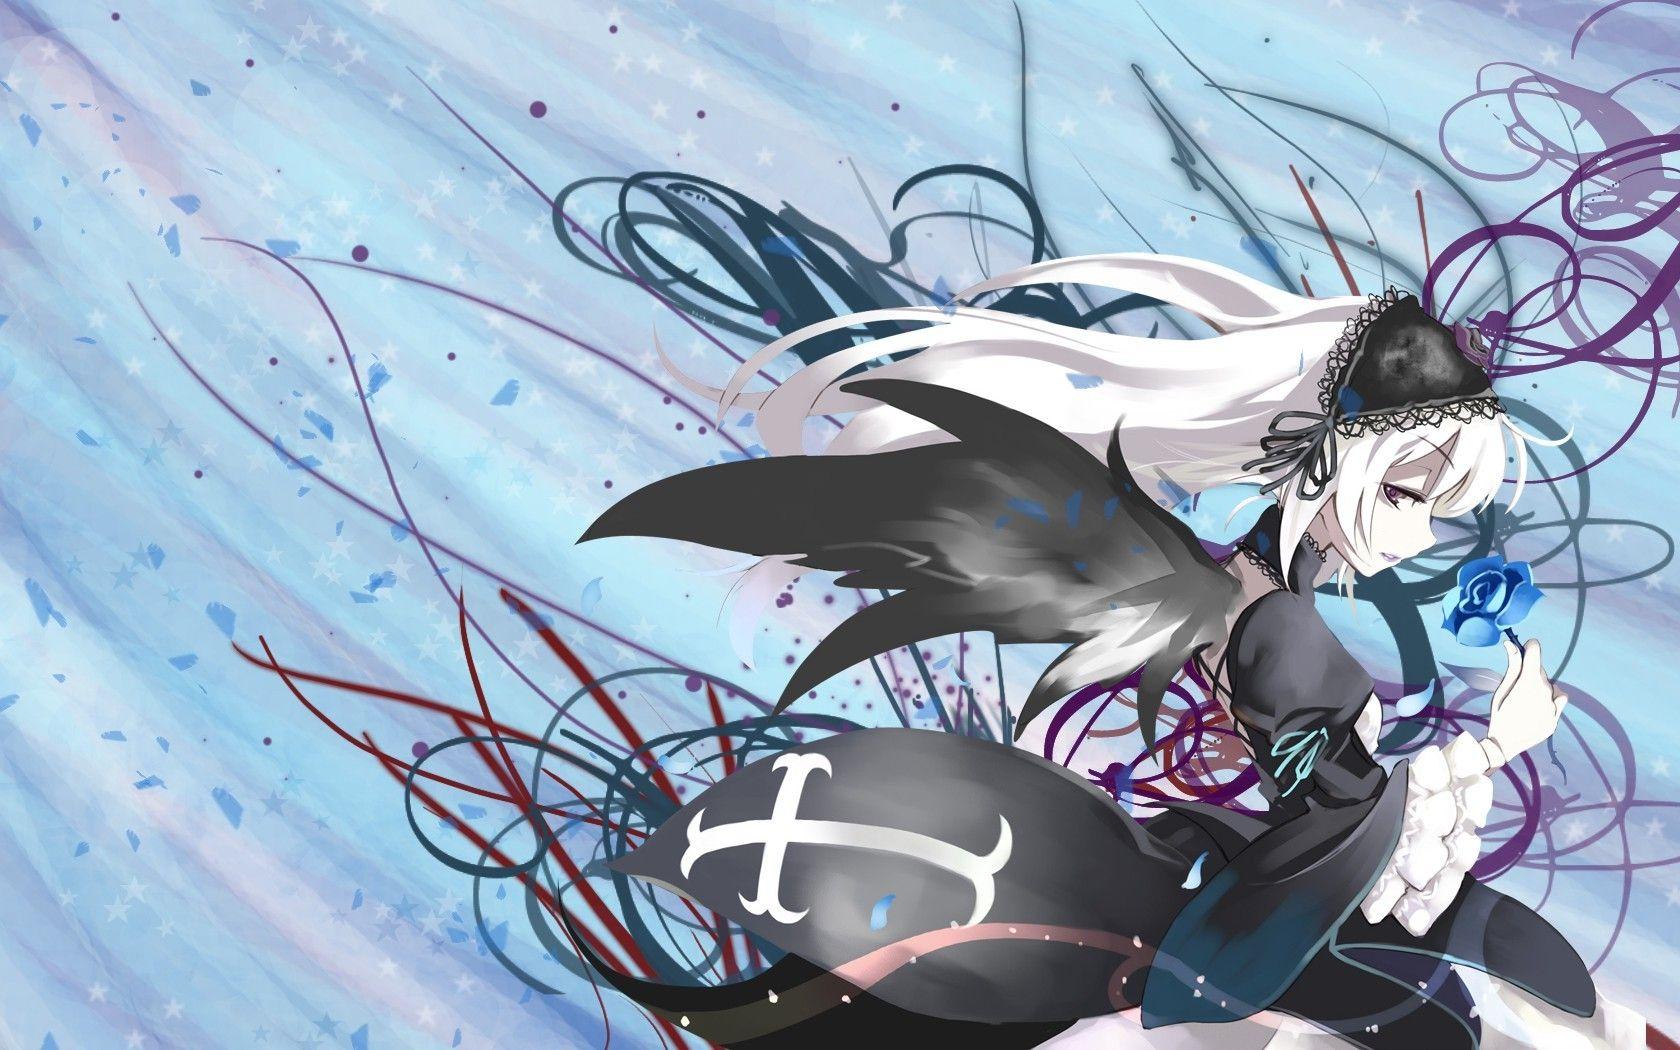 anime, Rozen Maiden, Suigintou Wallpaper   Anime, Desktop ...